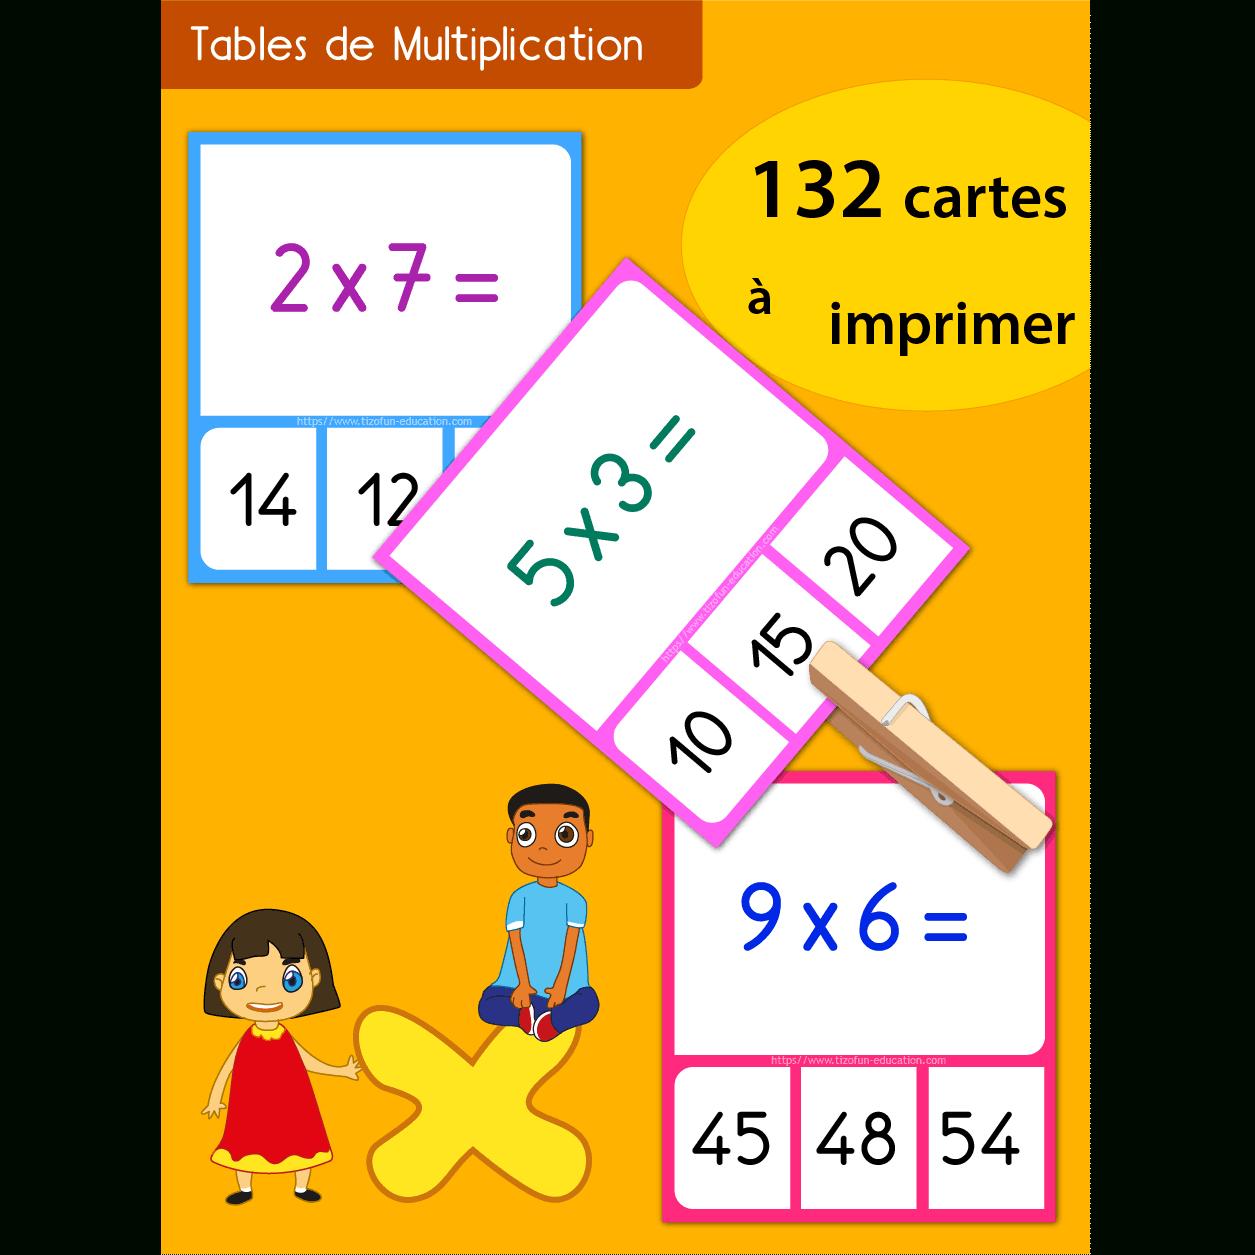 Jeu Memory Tables De Multiplication À Imprimer pour Apprendre La Table De Multiplication En Jouant